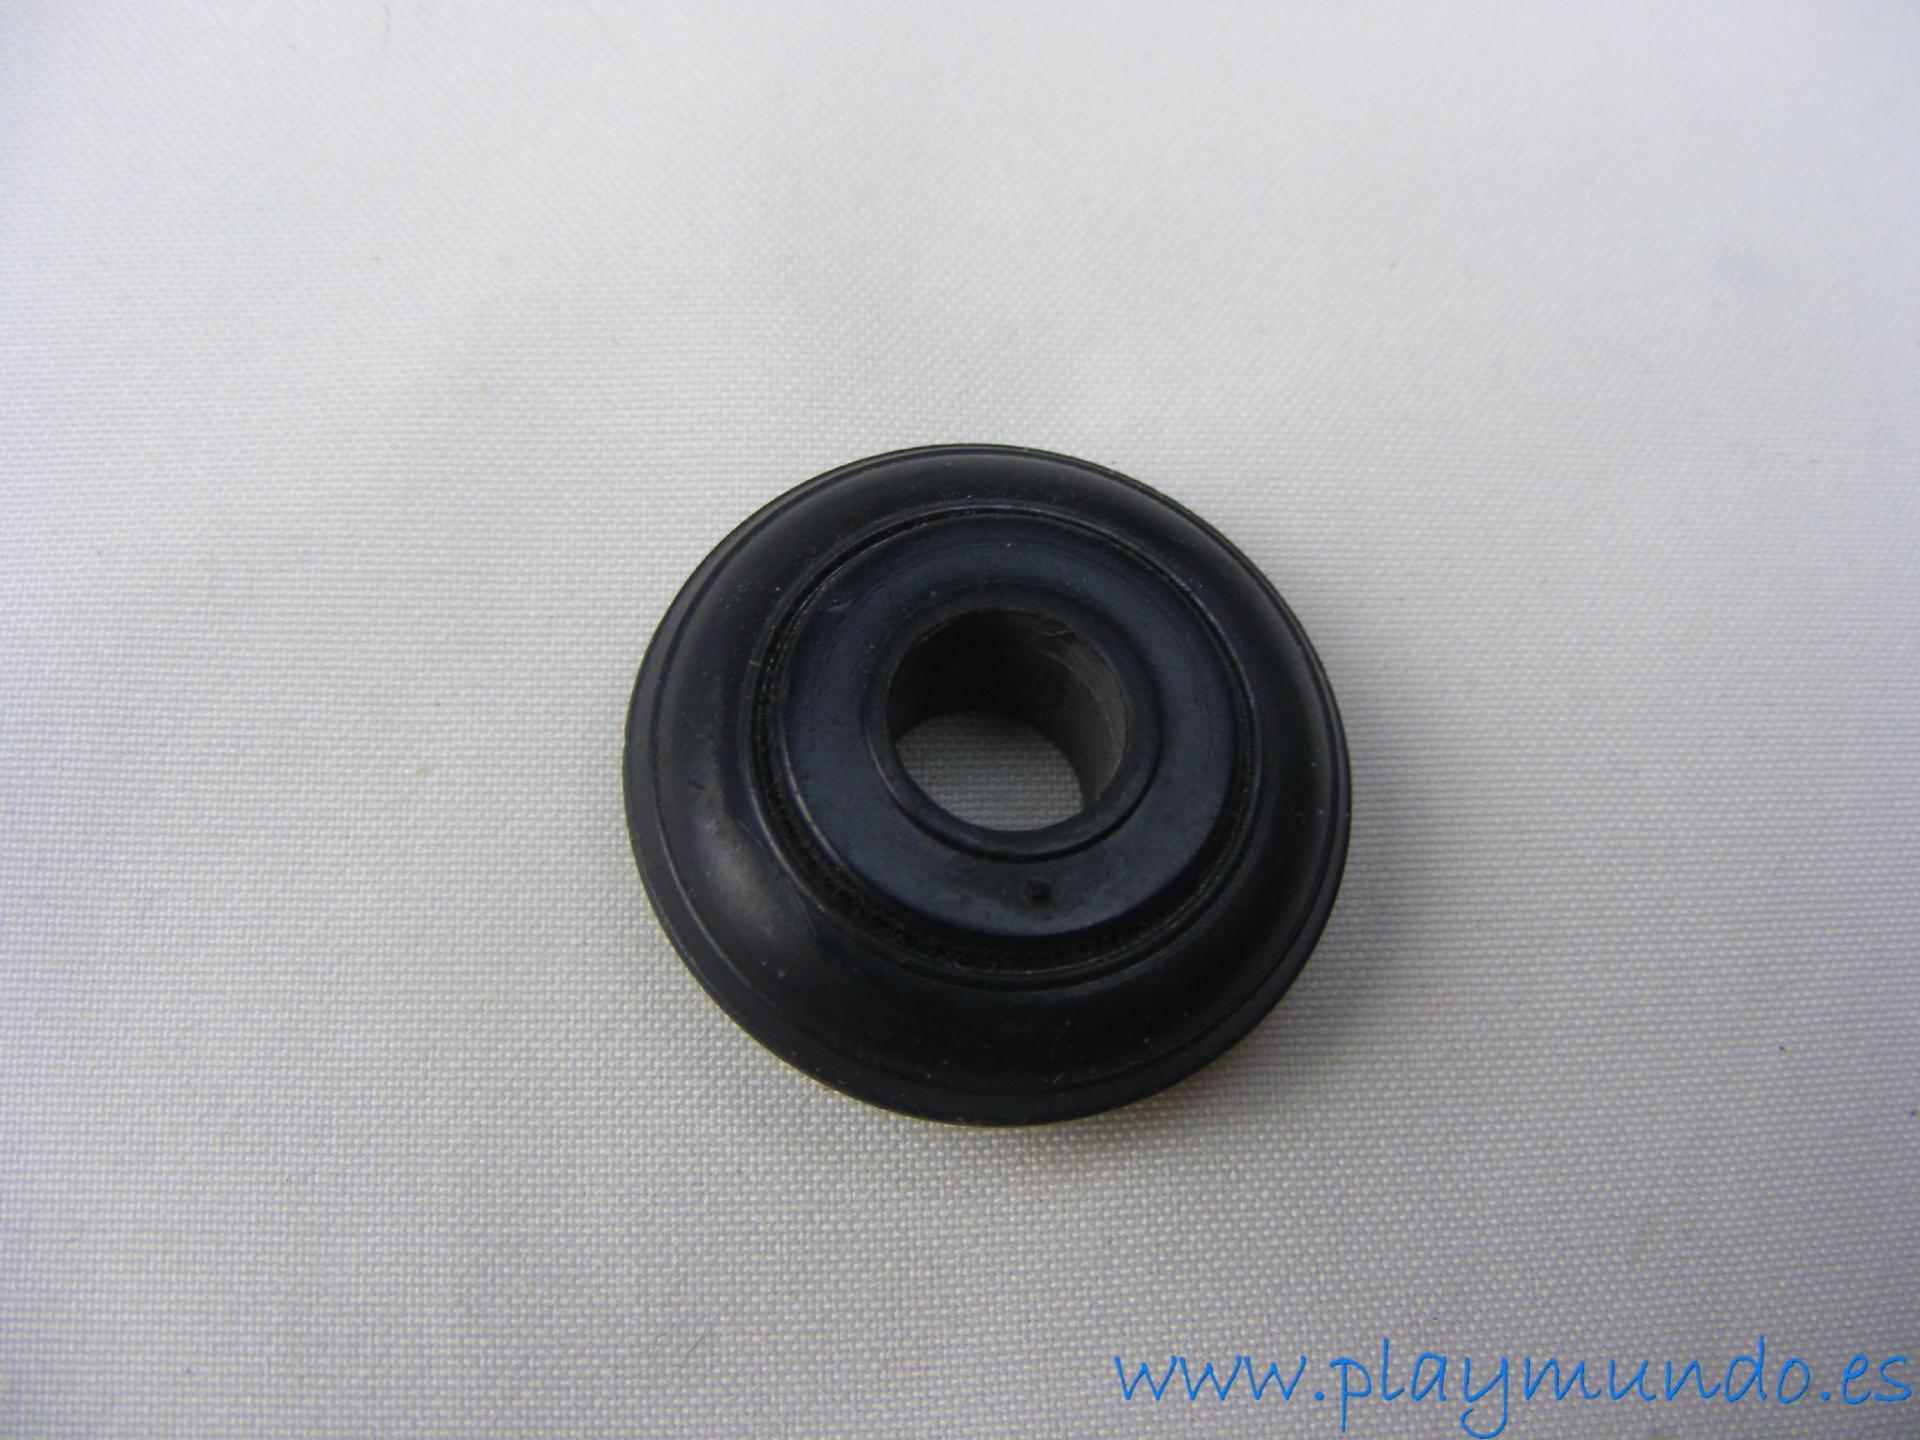 PLAYMOBIL RUEDA DEL BIPLANO REF. 3246 (MOD 2)